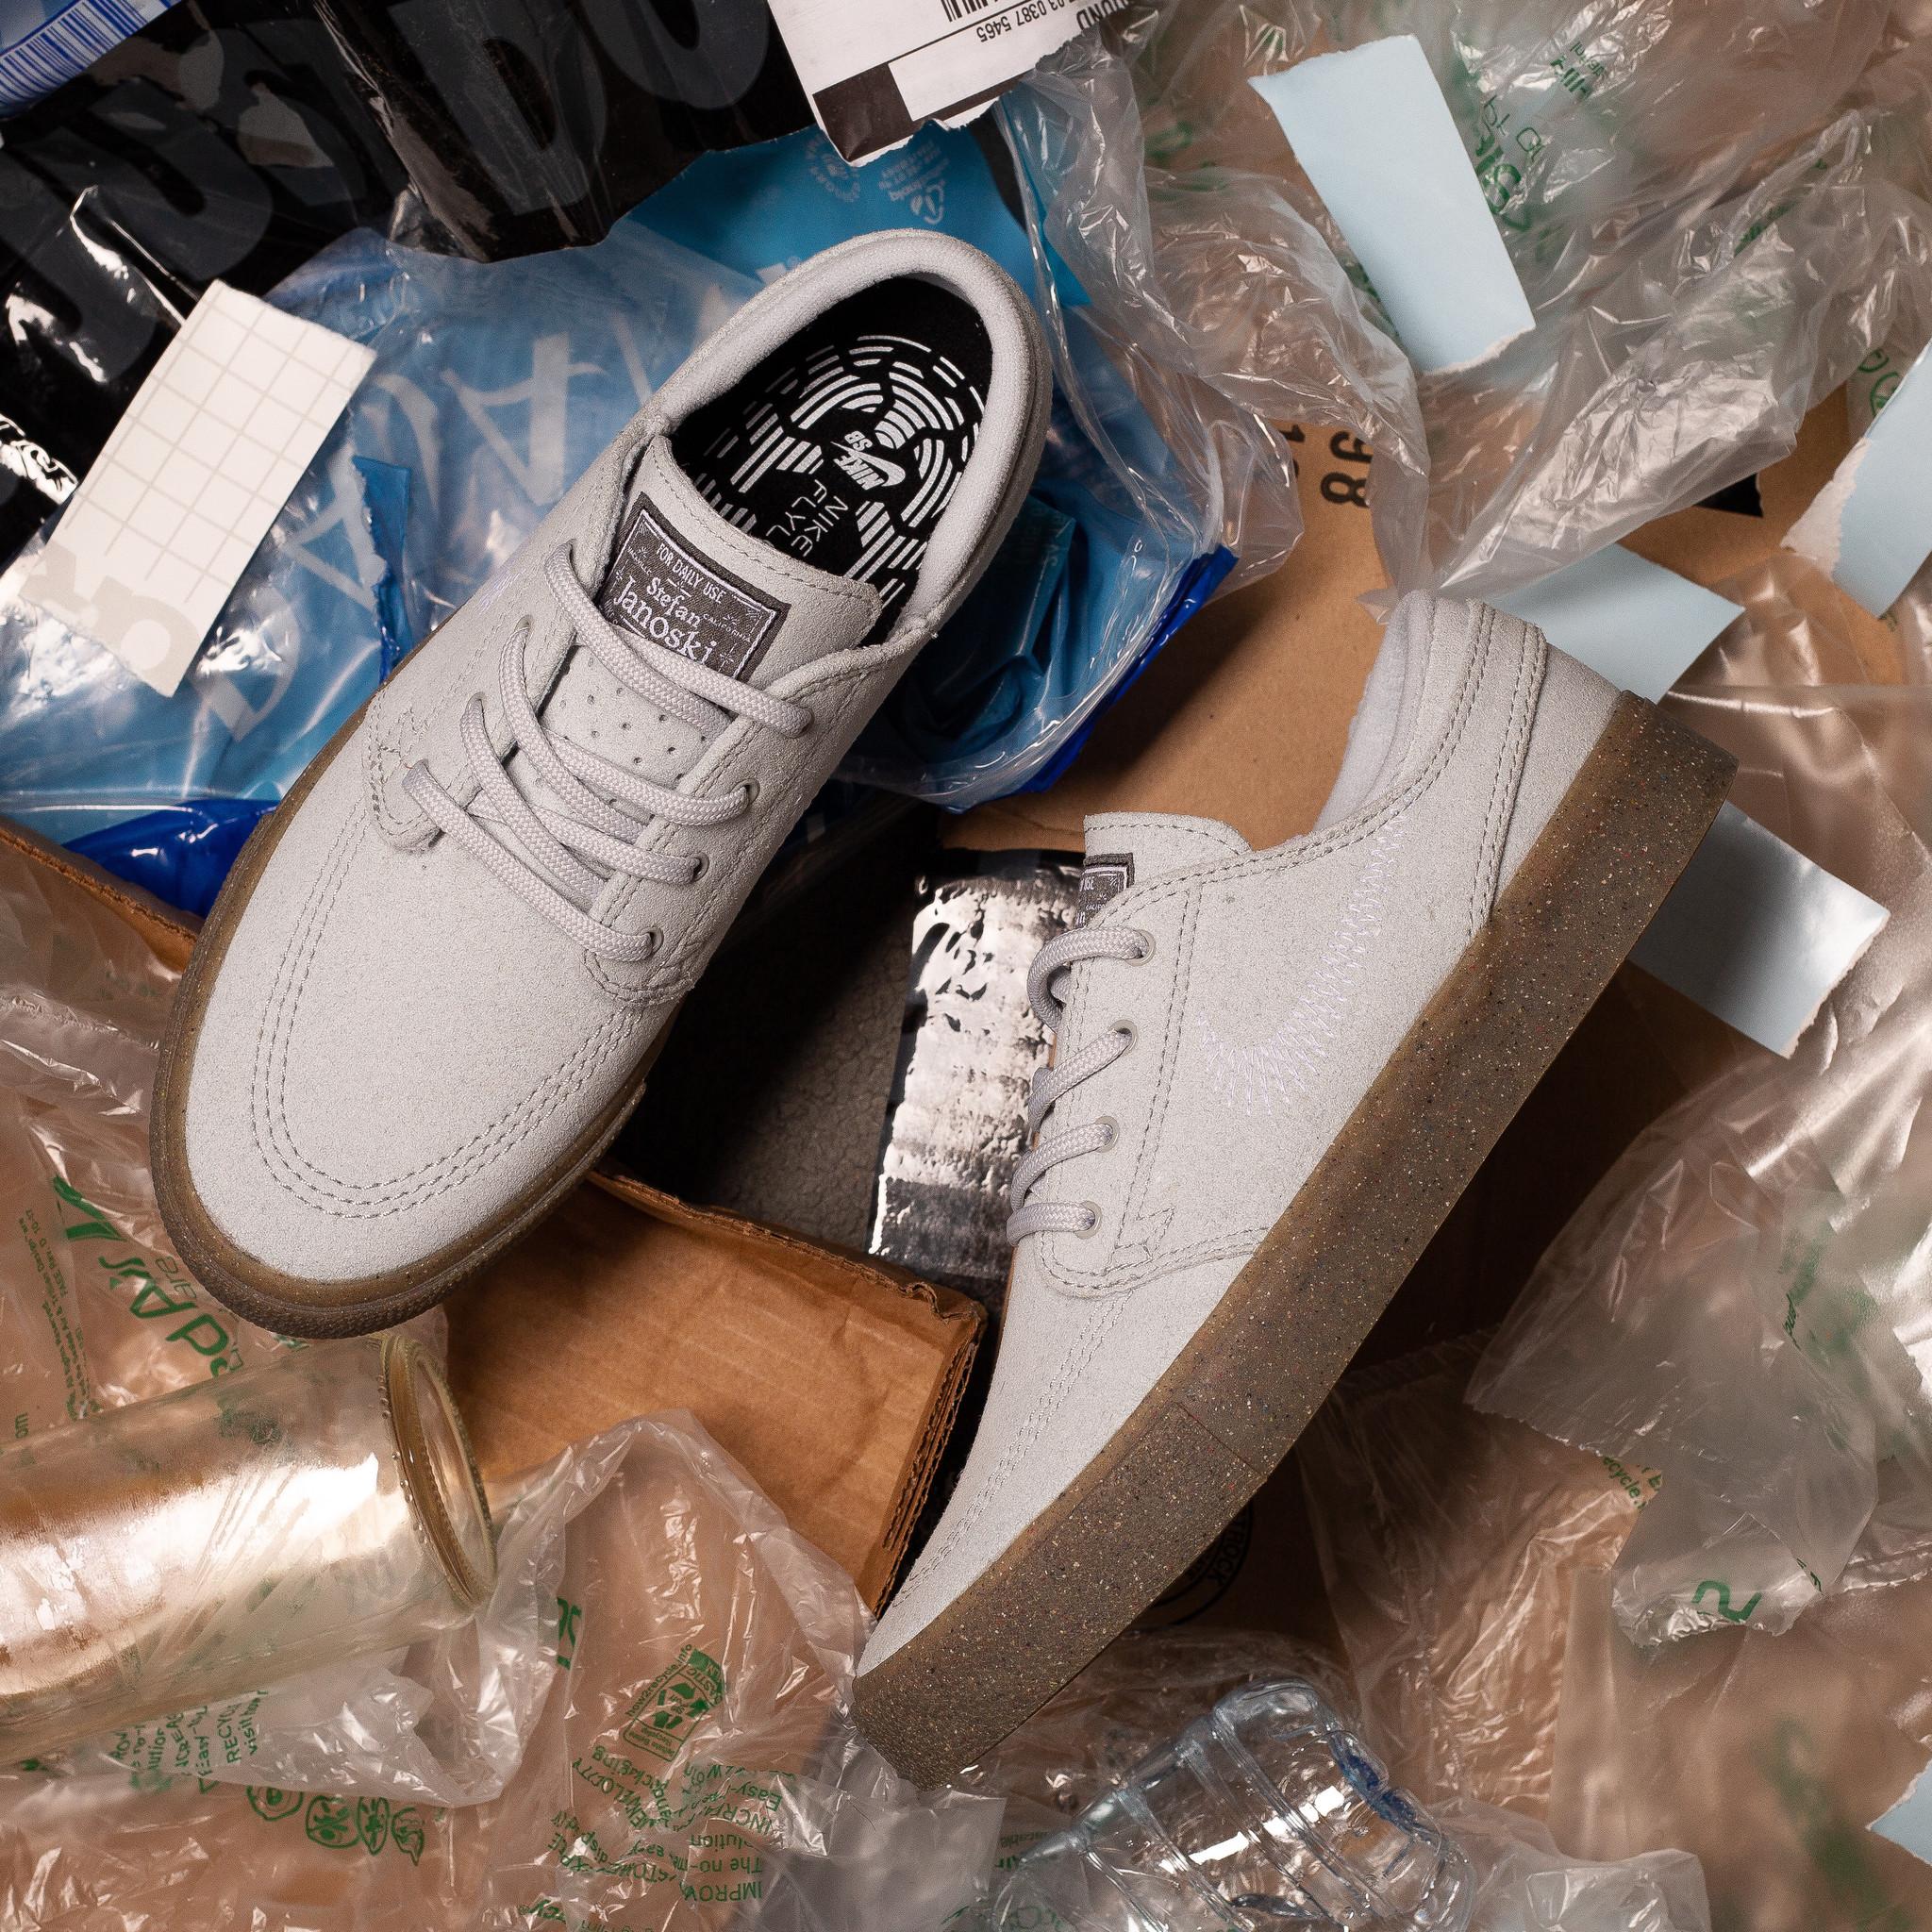 Nike SB Janoski Flyleather RM recylced